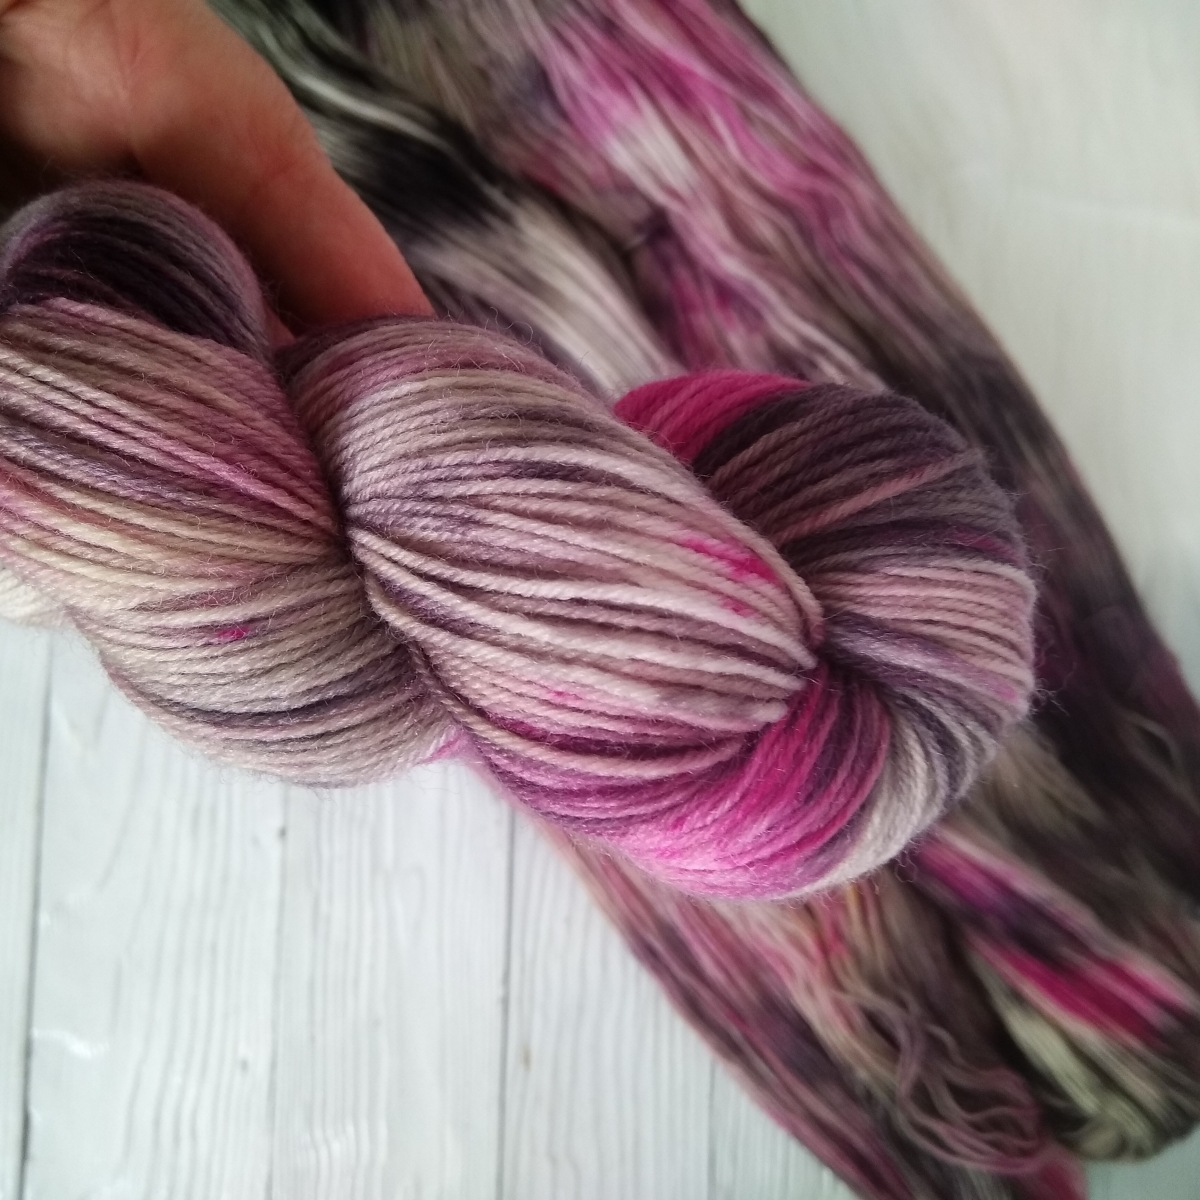 woodico.pro hand dyed yarn 037 1 1200x1200 - Hand dyed yarn / 037